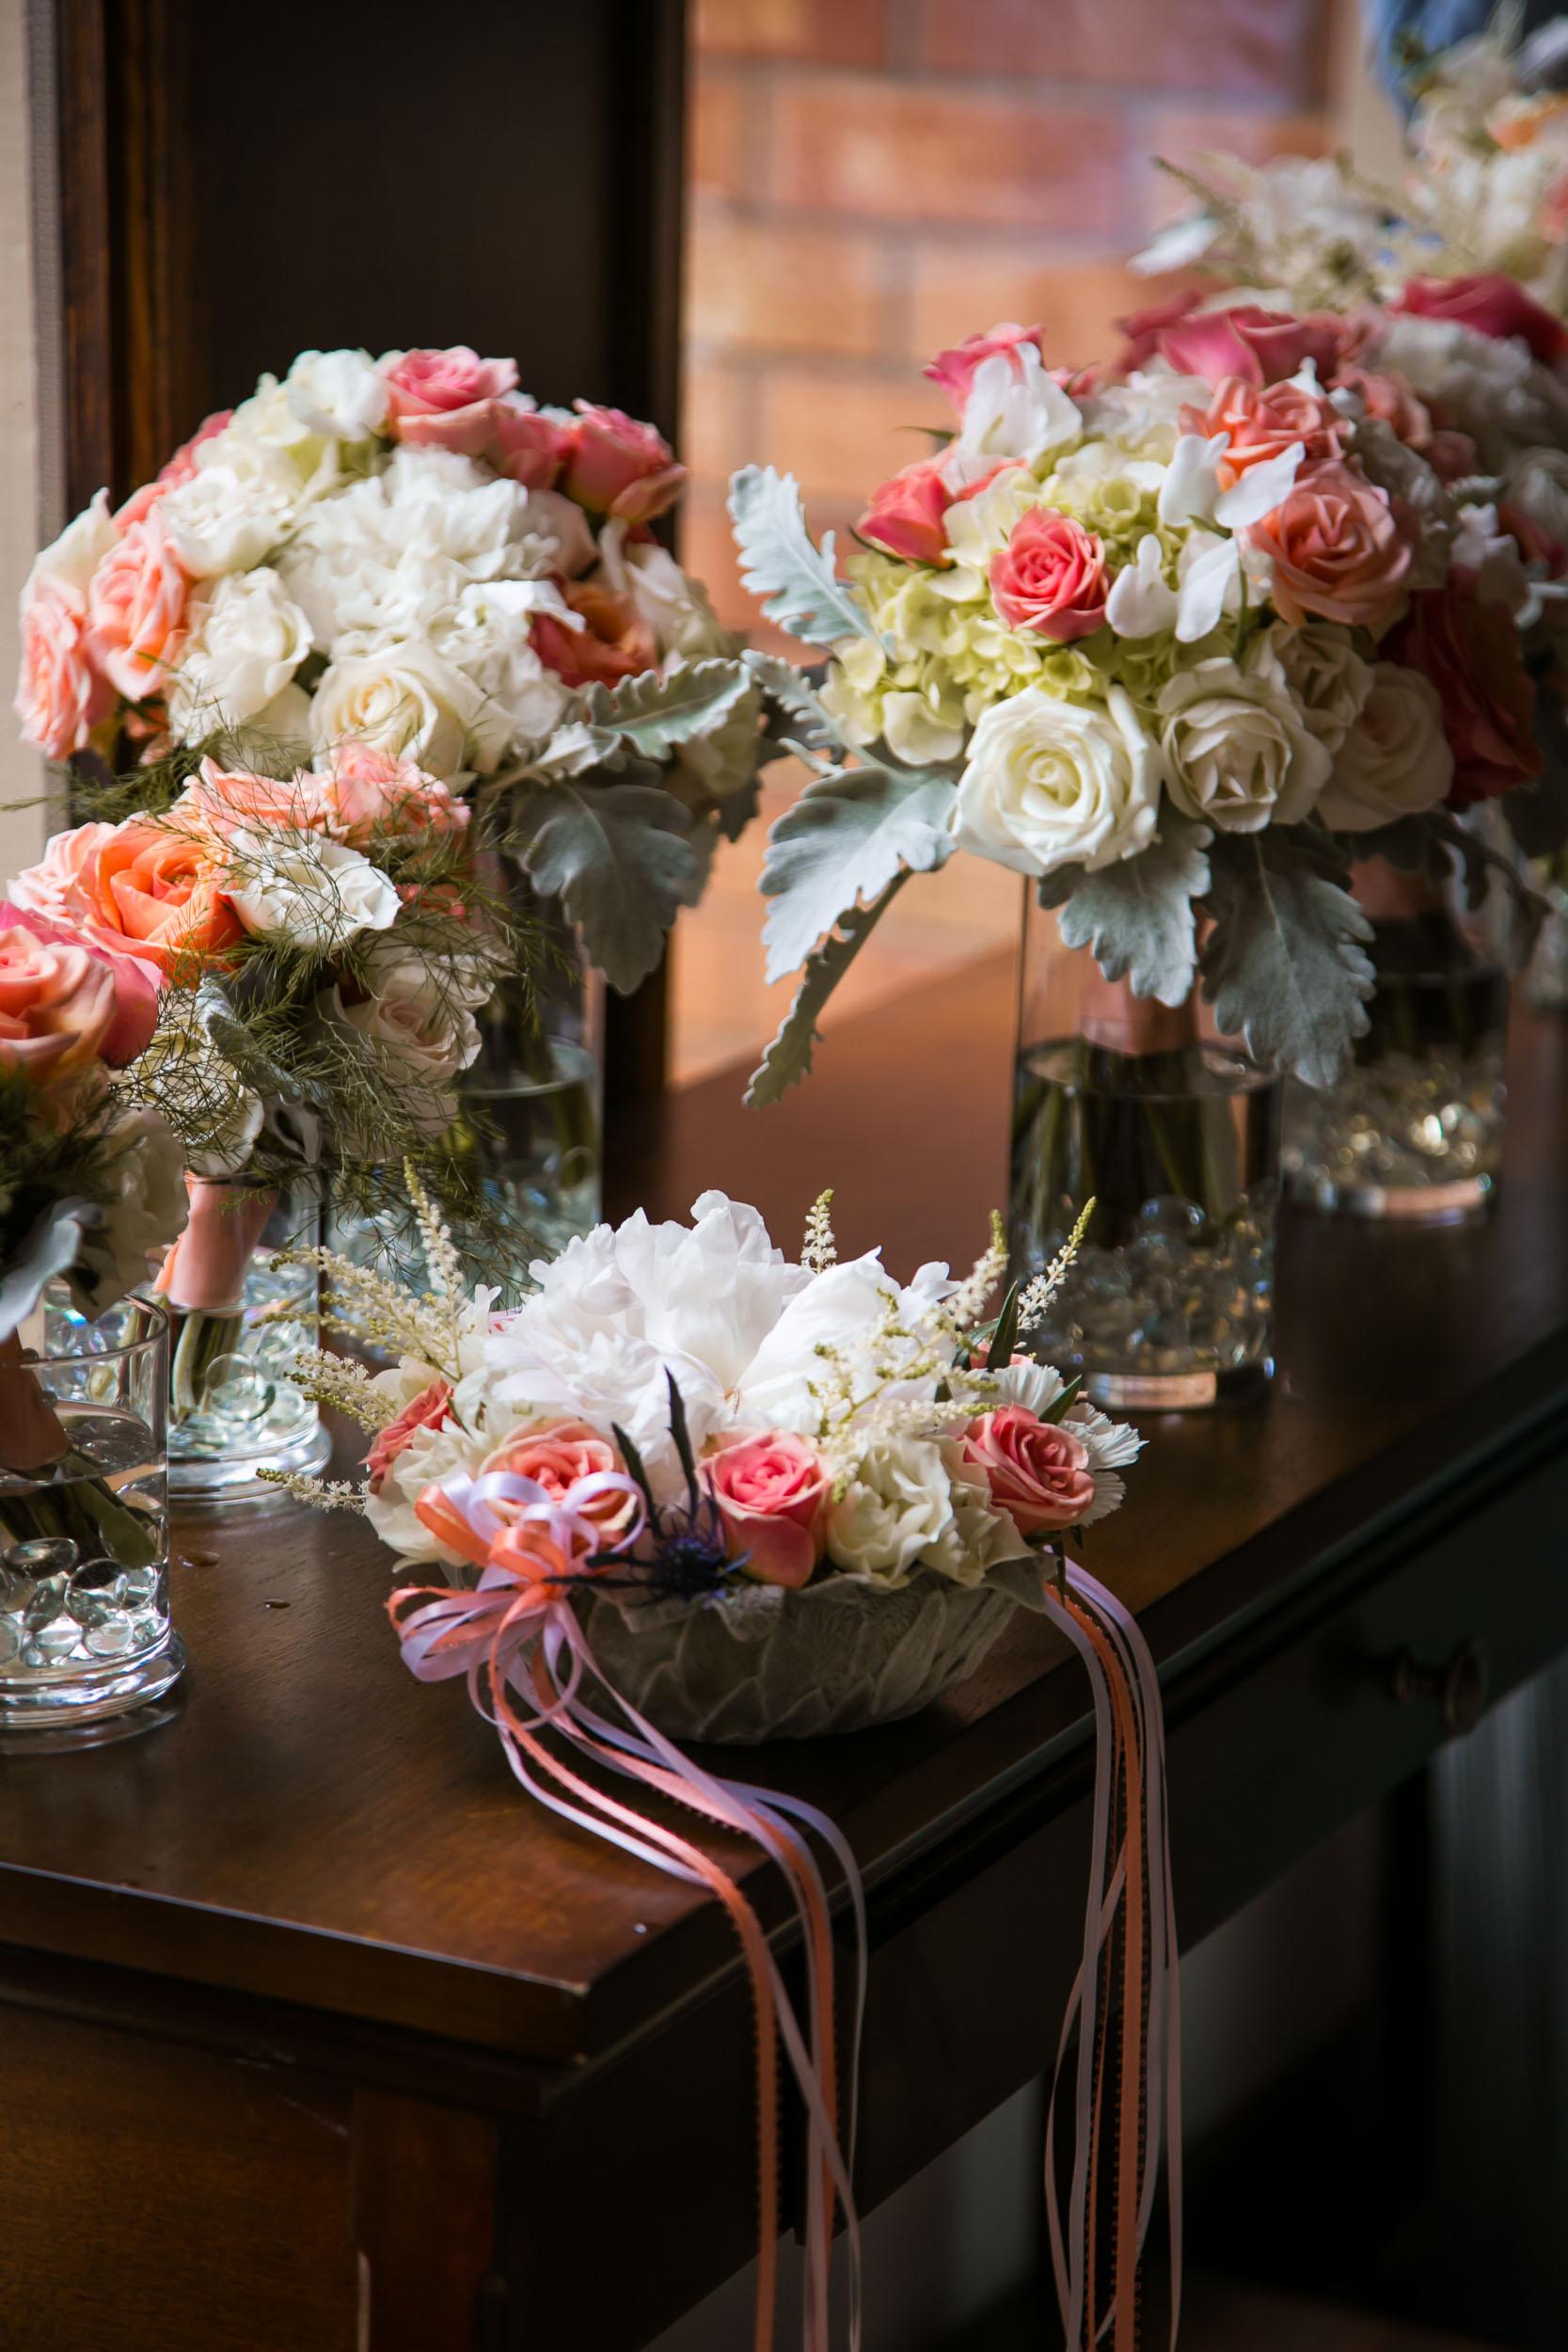 Raleigh Wedding Photographer   G. Lin Photography   Flower arrangement on table at church